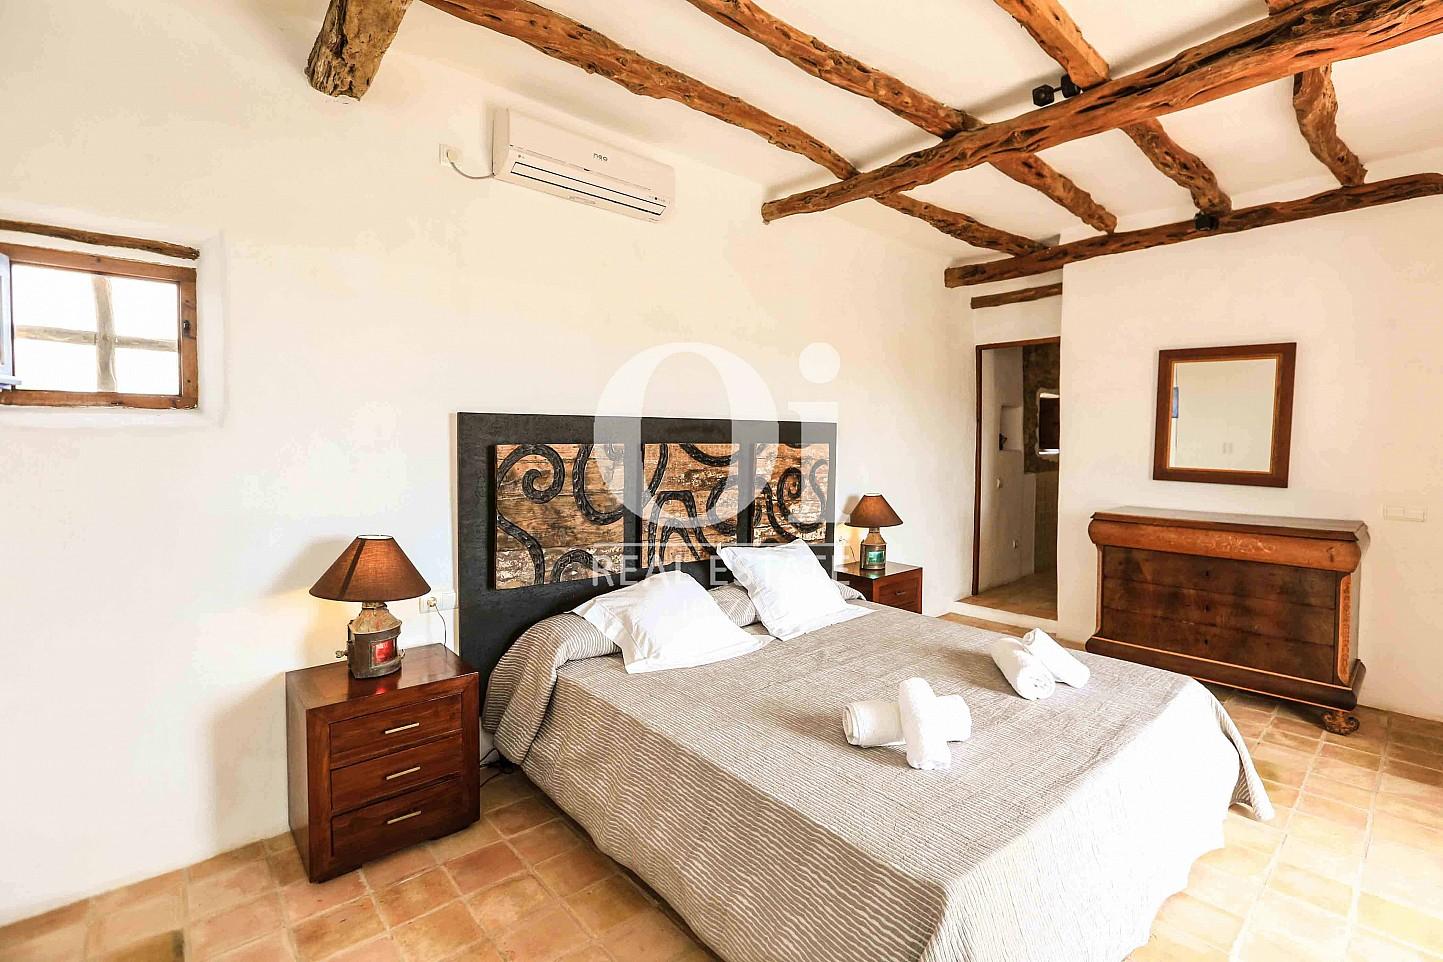 Chambre double de villa de séjour à Puig d'en Valls, Ibiza